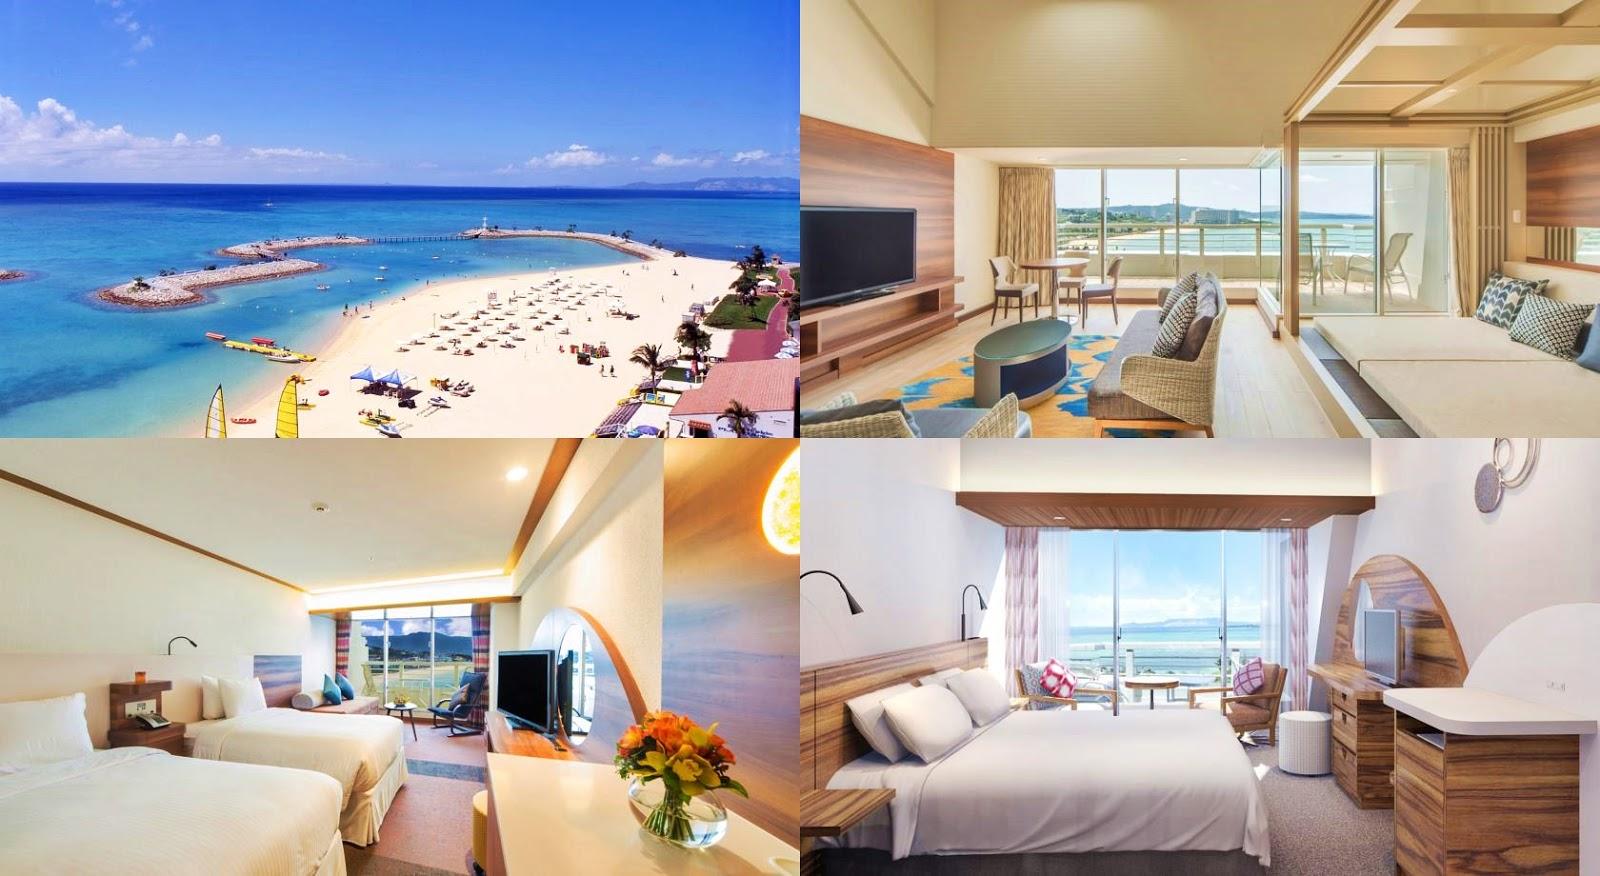 沖繩-住宿-推薦-沖繩喜來登度假酒店-Sheraton-Okinawa-Sunmarina-Resort-Okinawa-hotel-recommendation